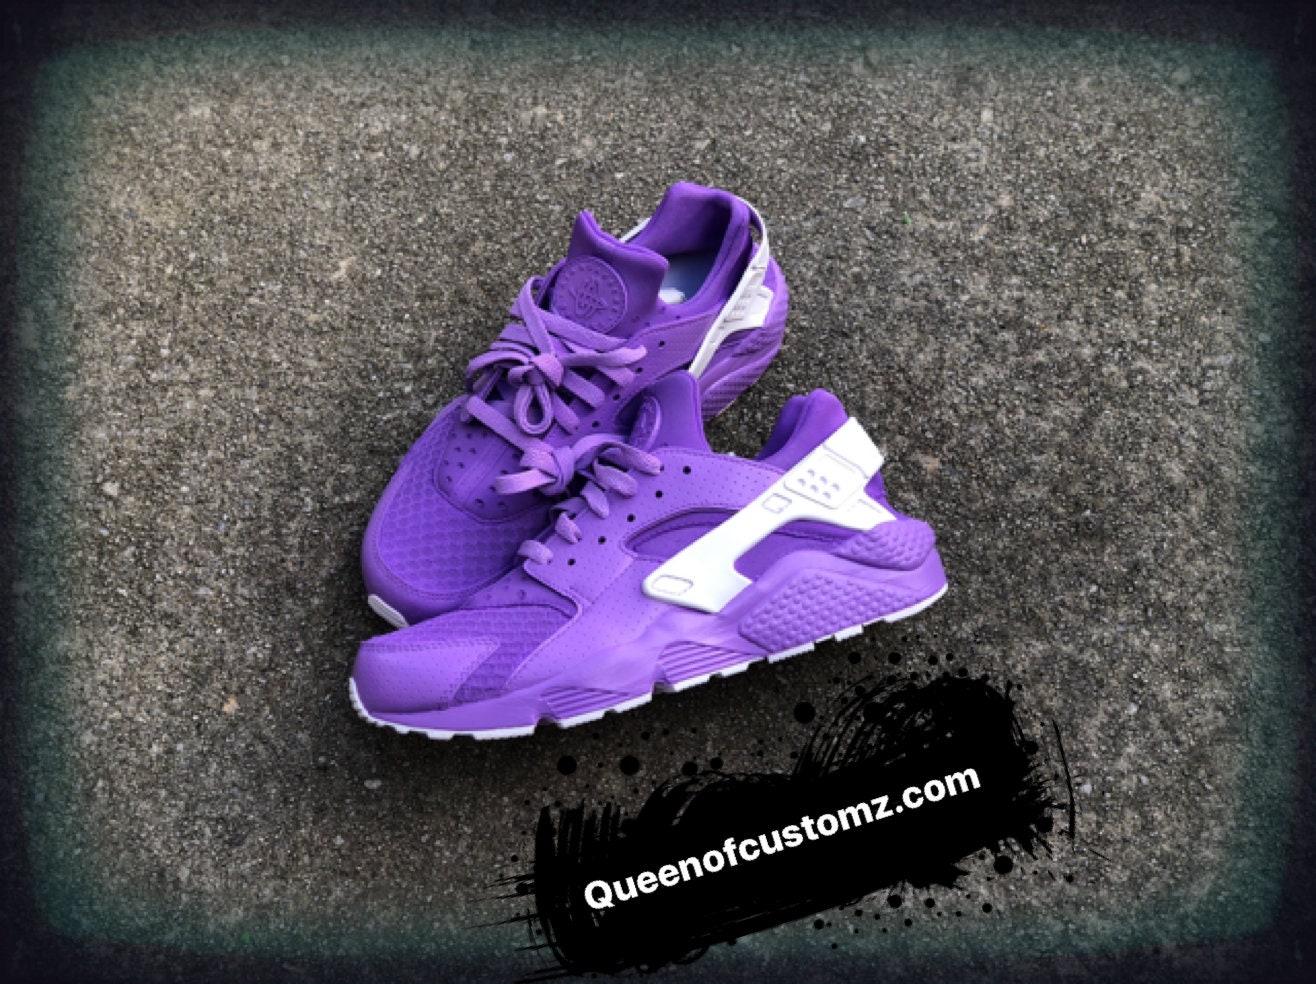 92f5272725bb Lilac Nike Huarache (custom). 1